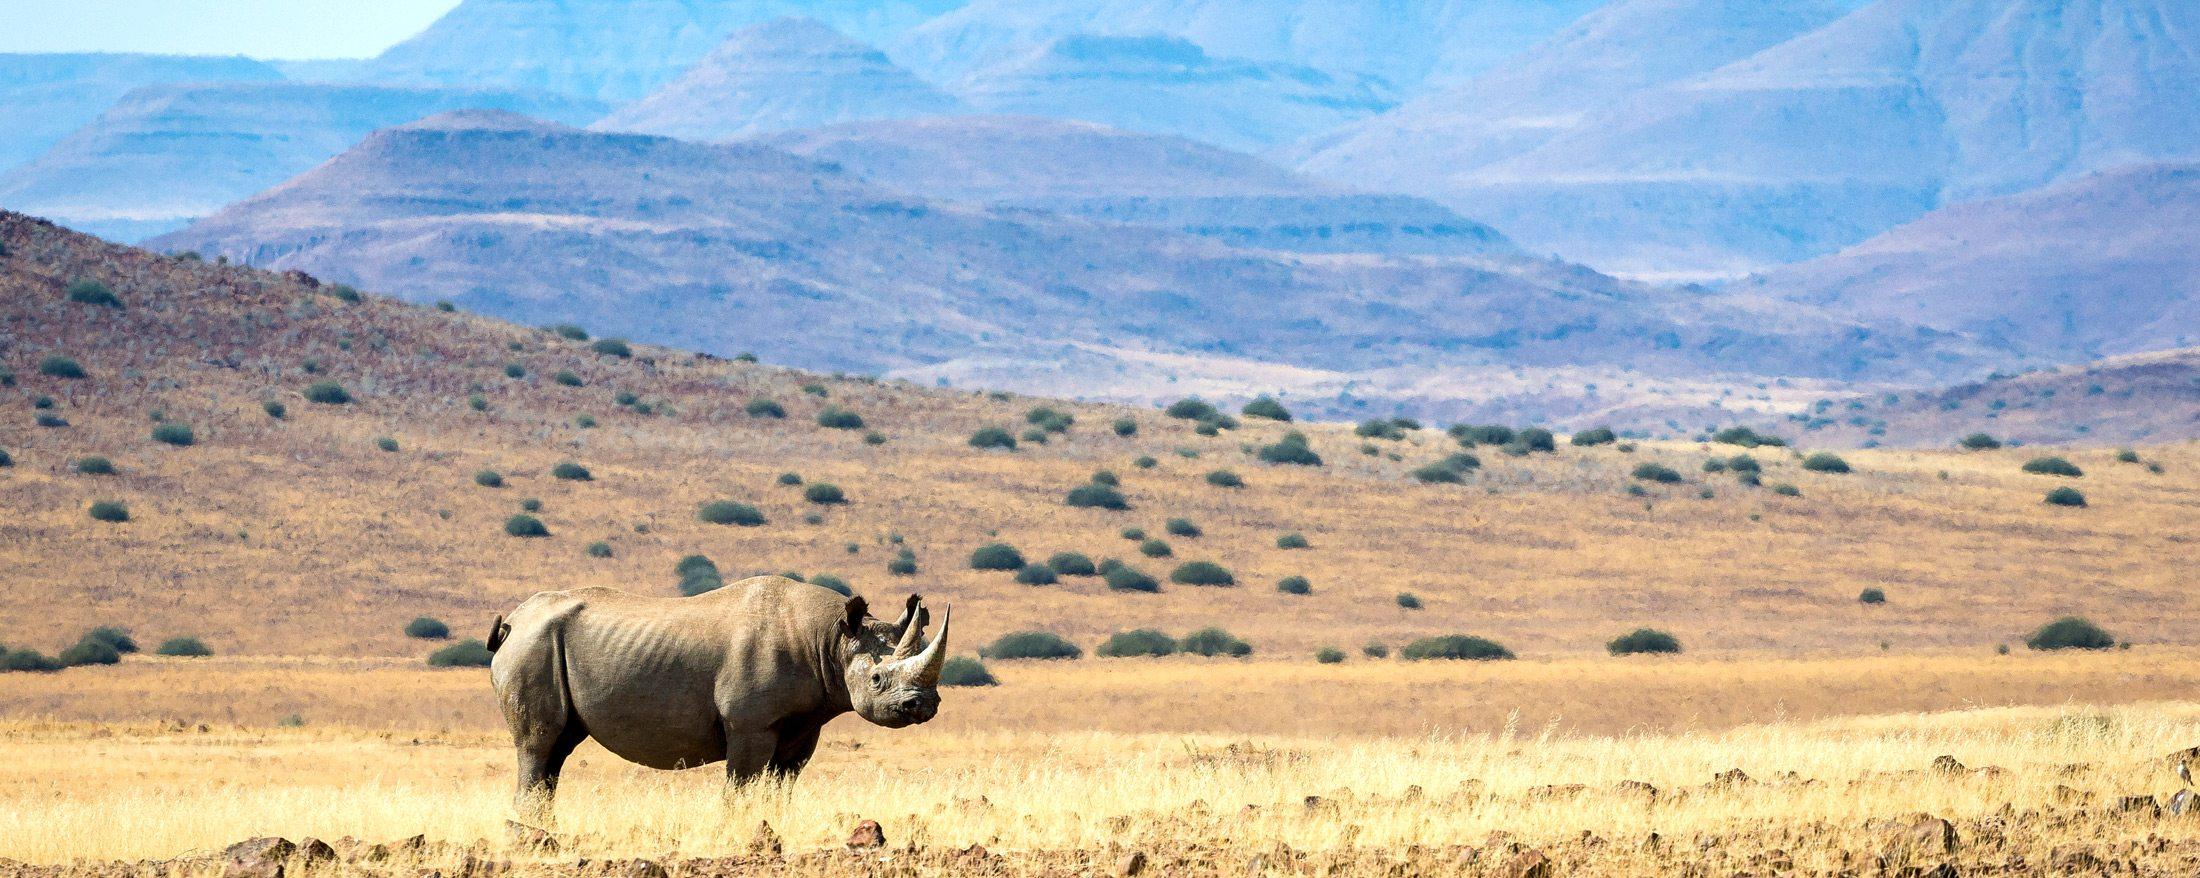 Desert-adapted black rhino can be found near Desert Rhino Camp.